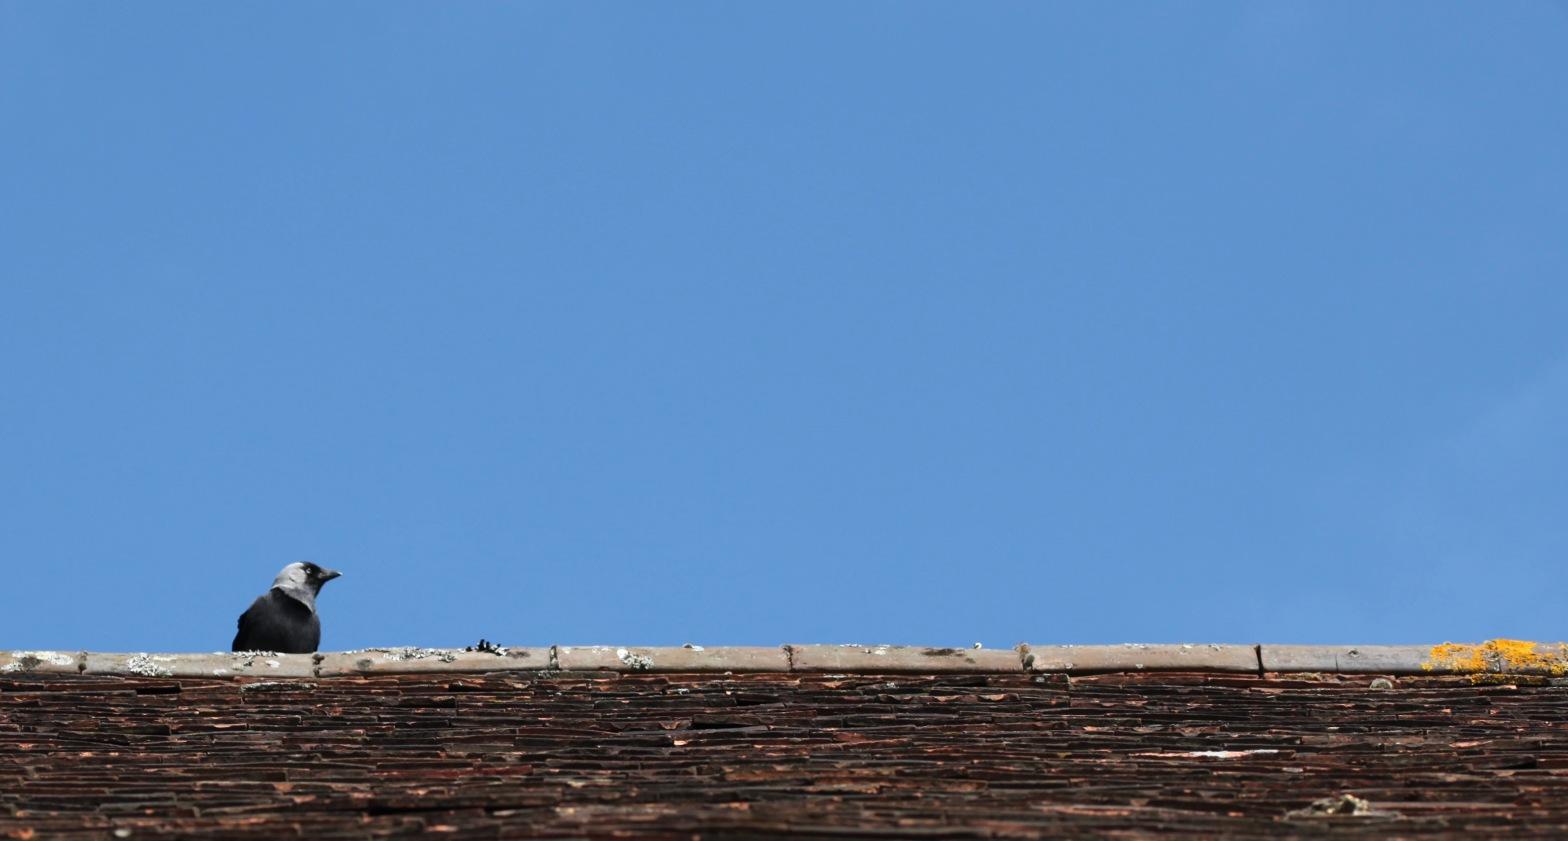 Jackdaw on rooftop 4